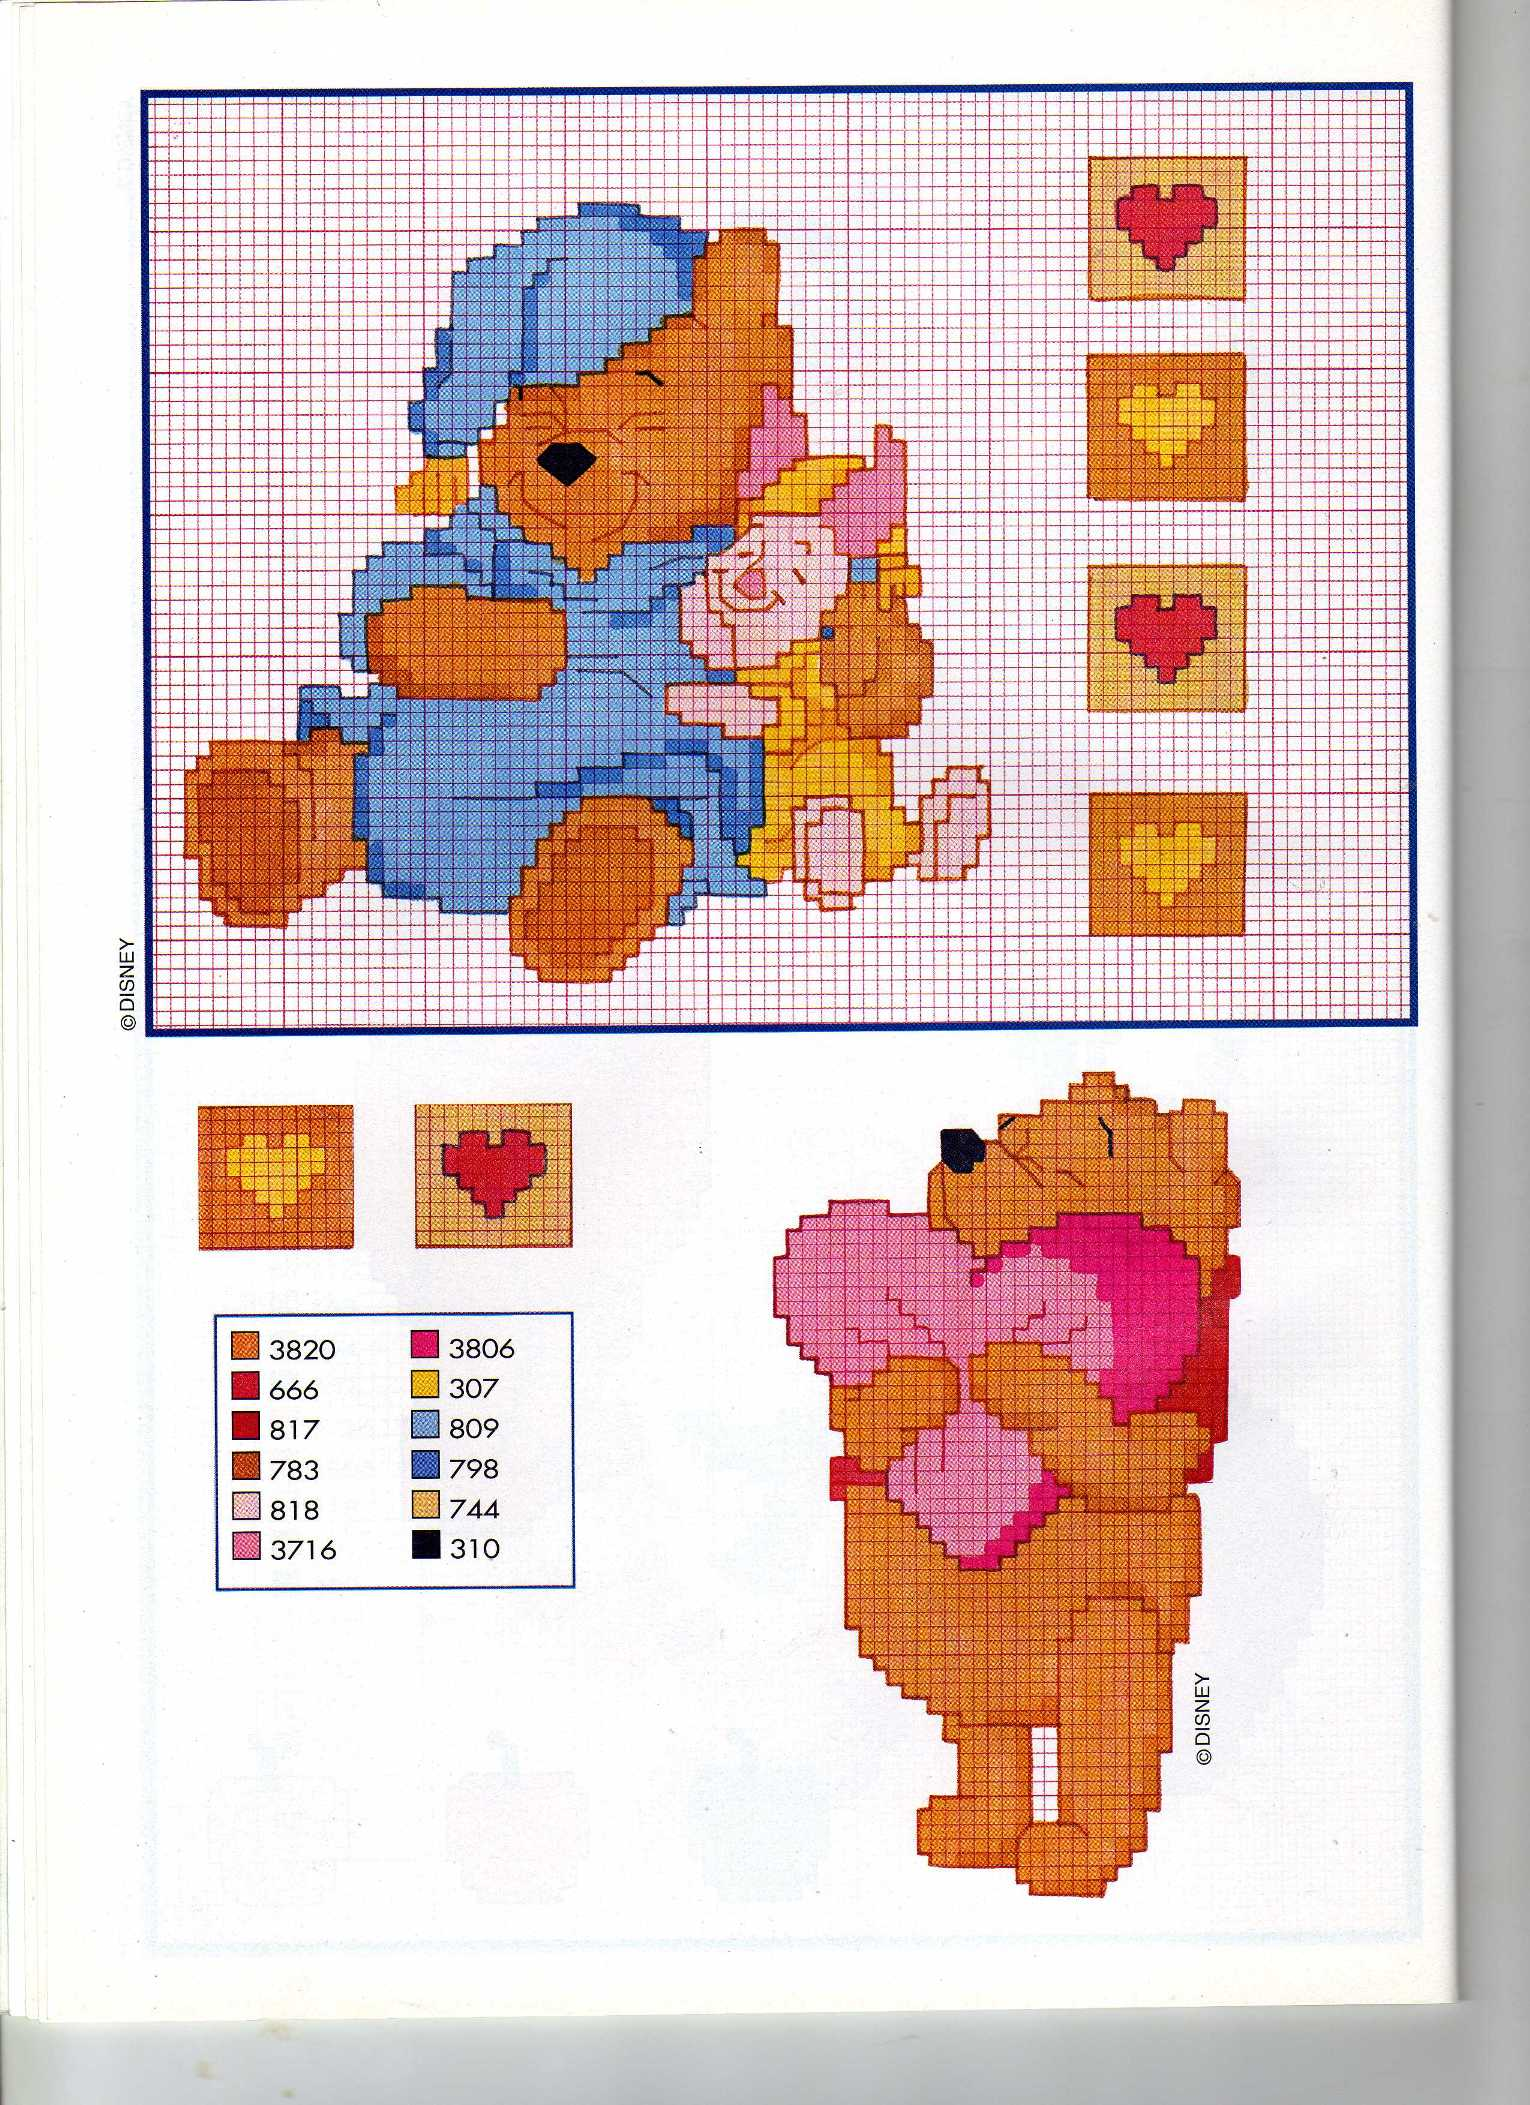 Winnie the pooh e pimpi nanna cuore punto for Winnie the pooh punto croce